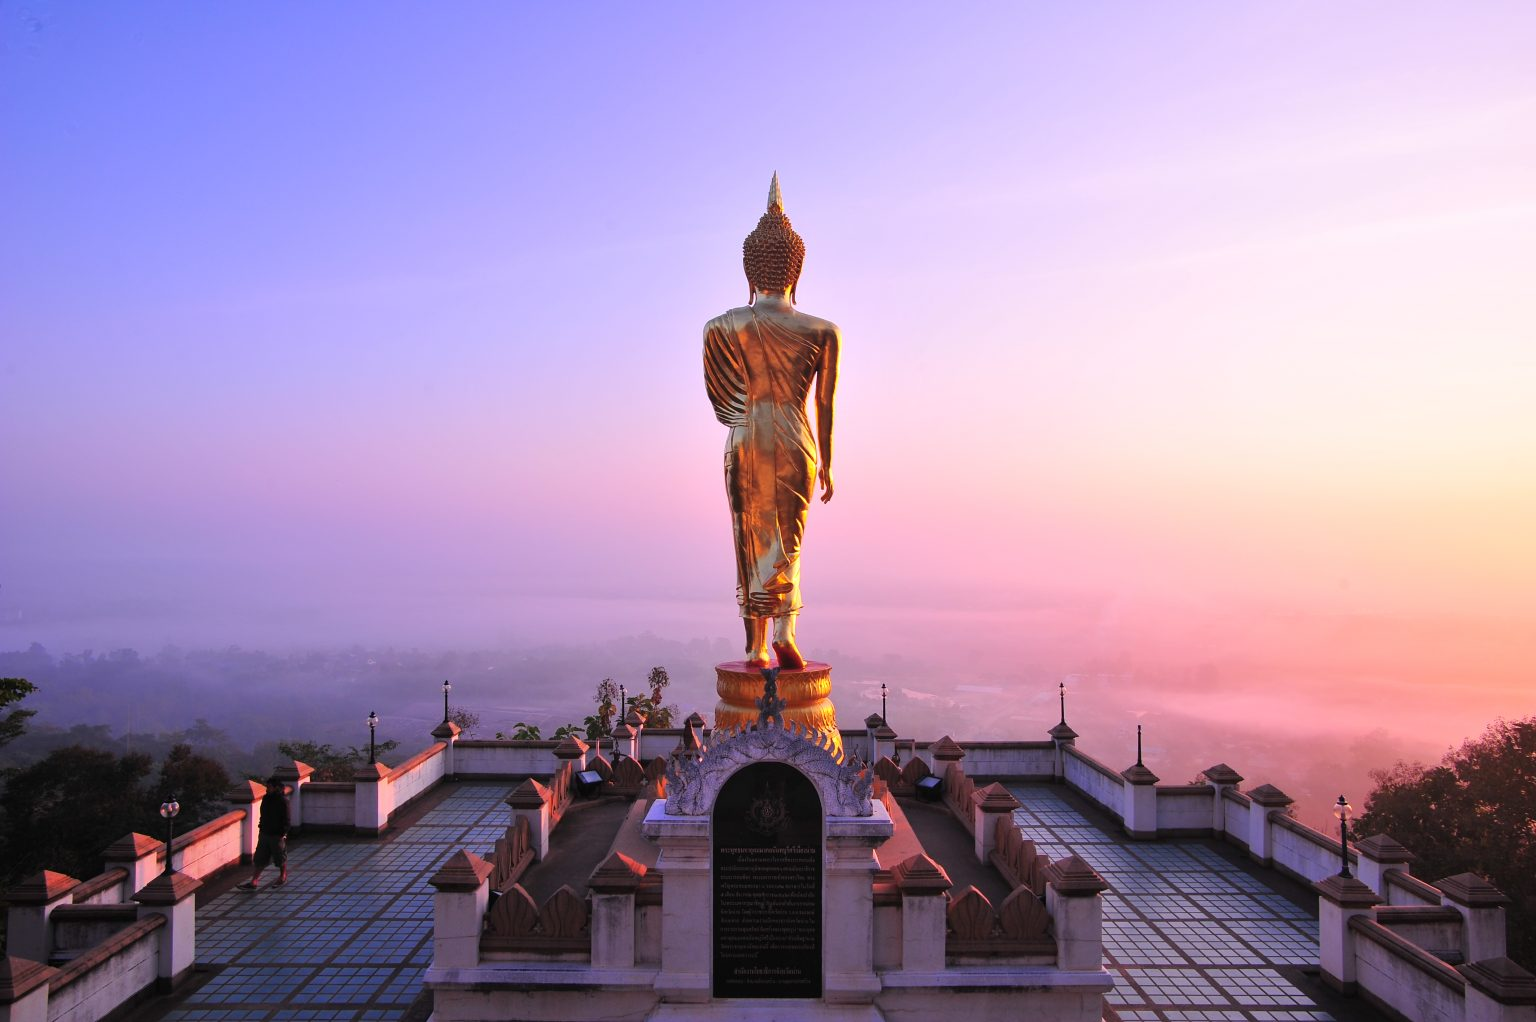 Землетрясение в Таиланде повредило 500-летний храм